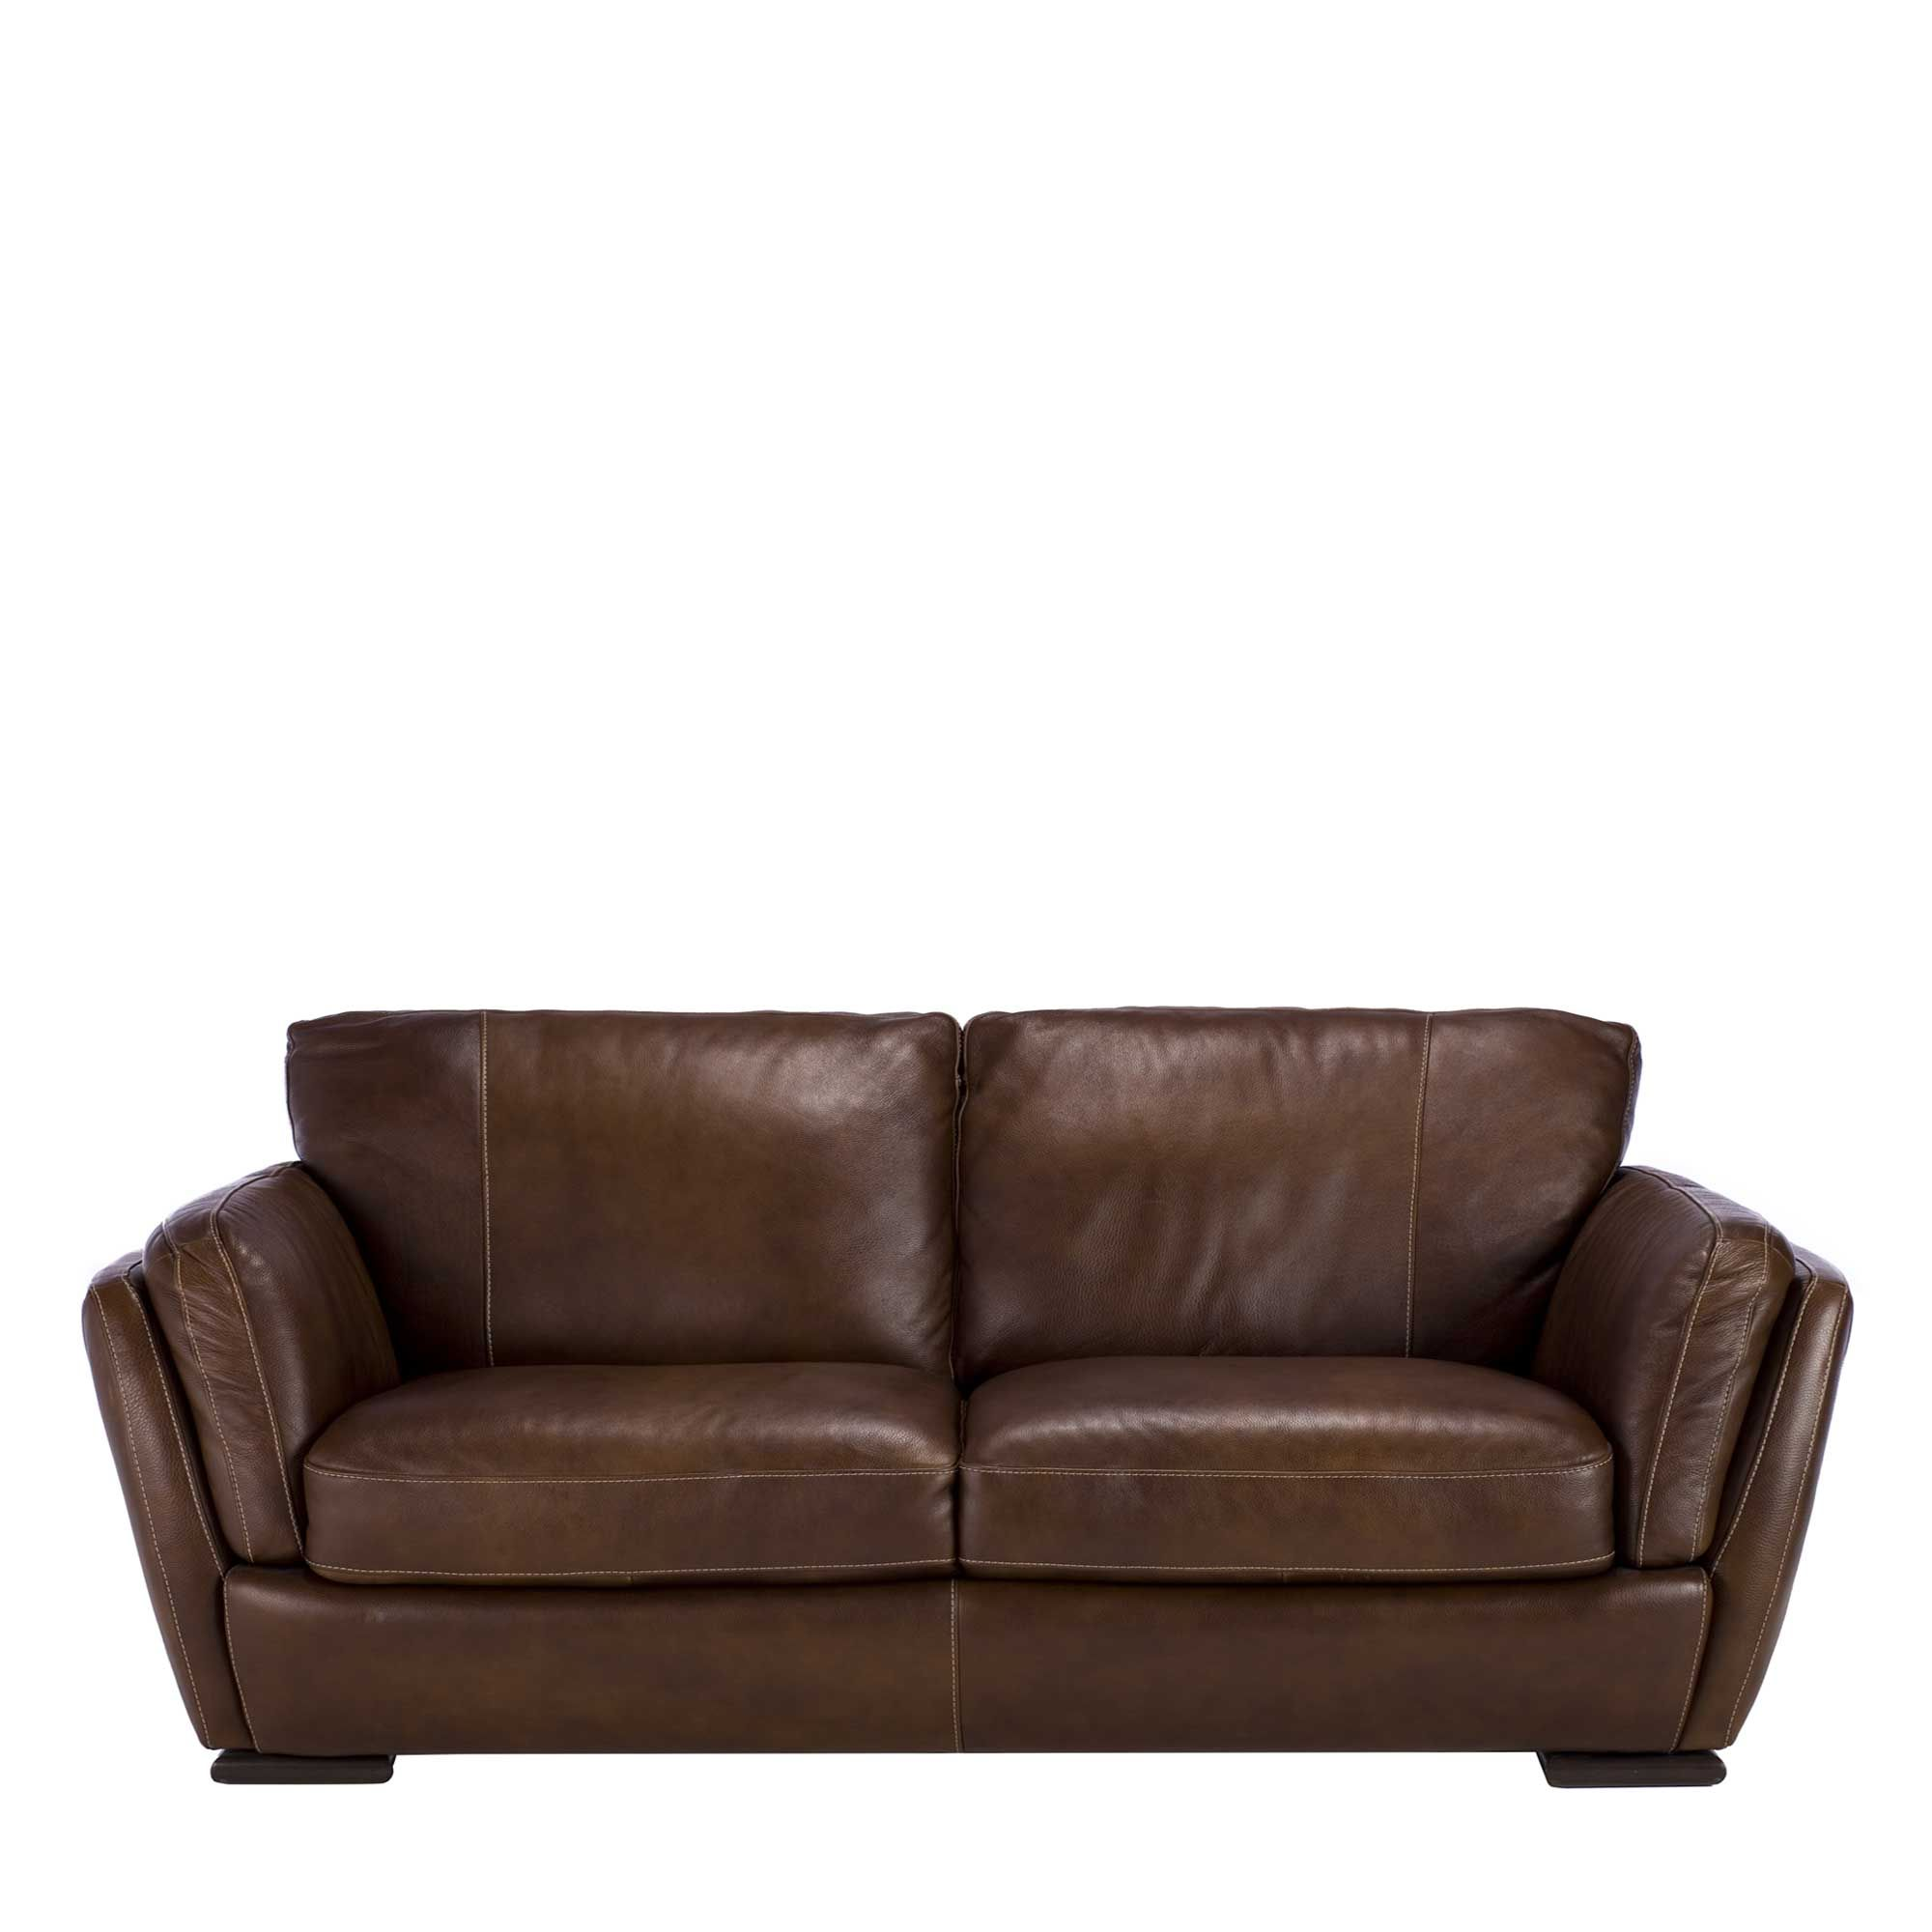 second hand corner sofas leeds scala leather sofa furniture village barker and stonehouse brokeasshome